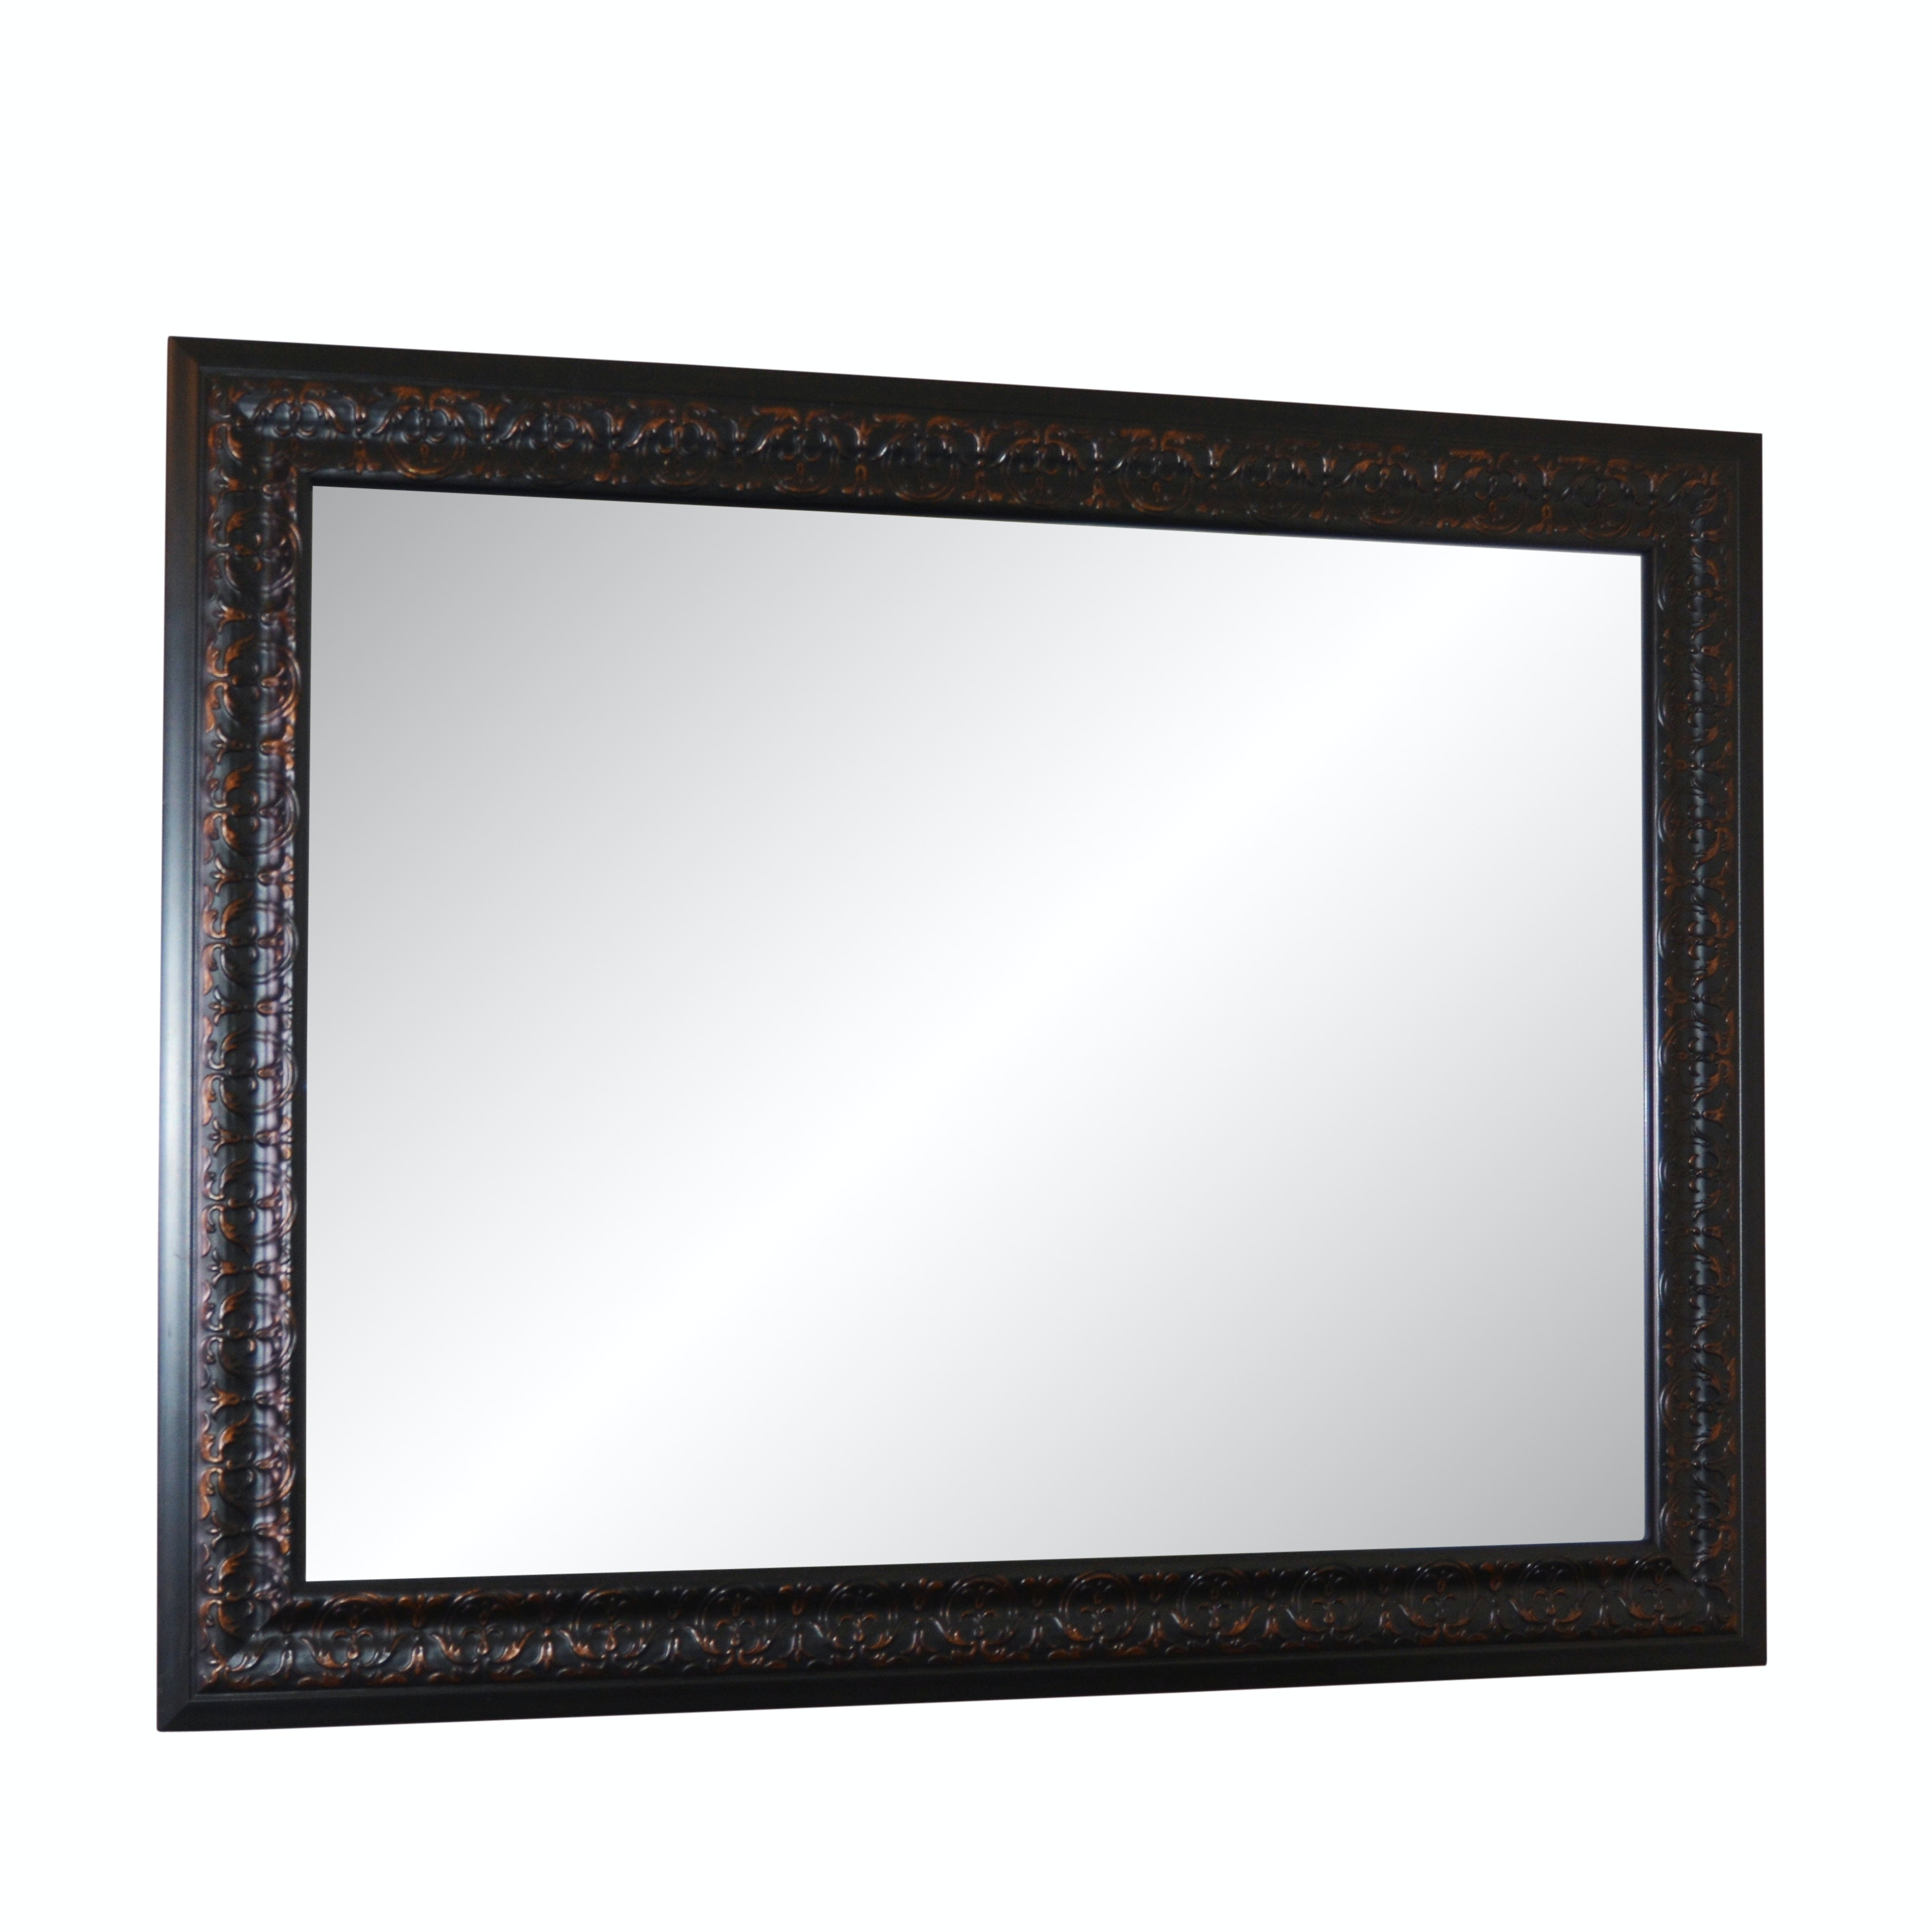 Rectangular Beveled Wall Mirror